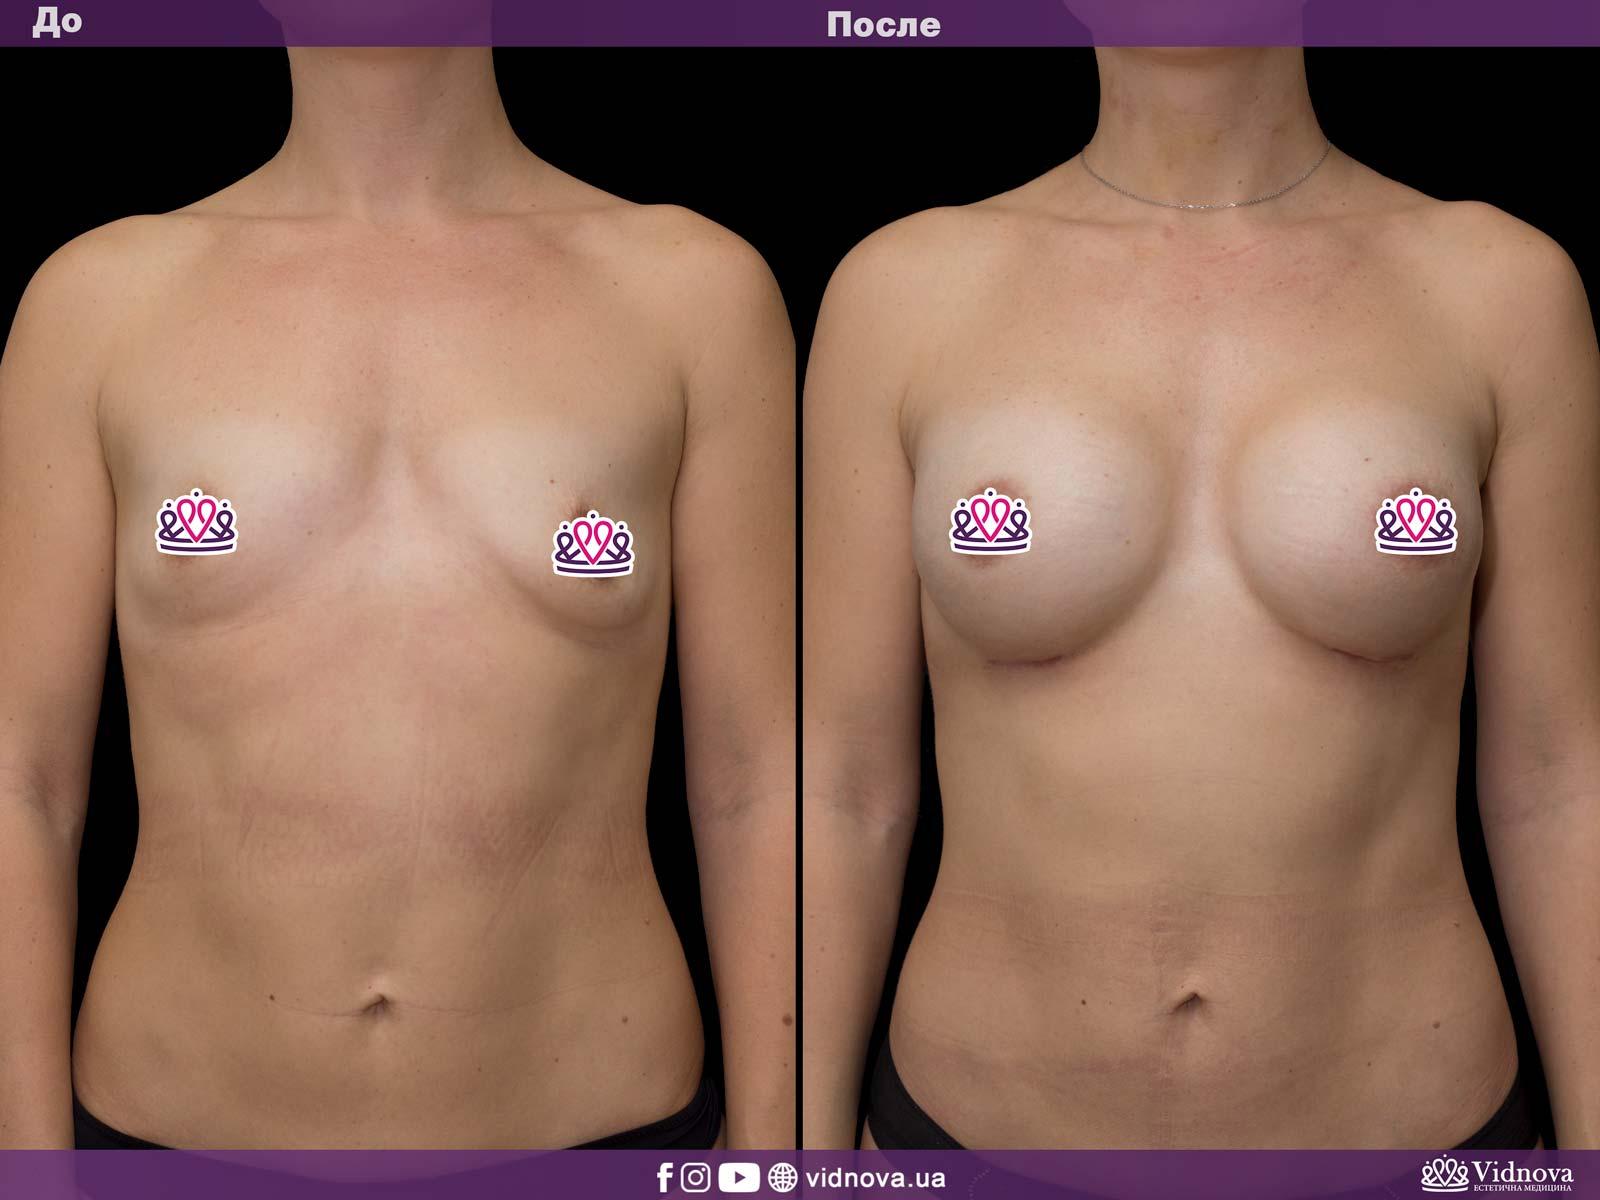 Увеличение груди: Фото ДО и ПОСЛЕ - Пример №34-1 - Клиника Vidnova